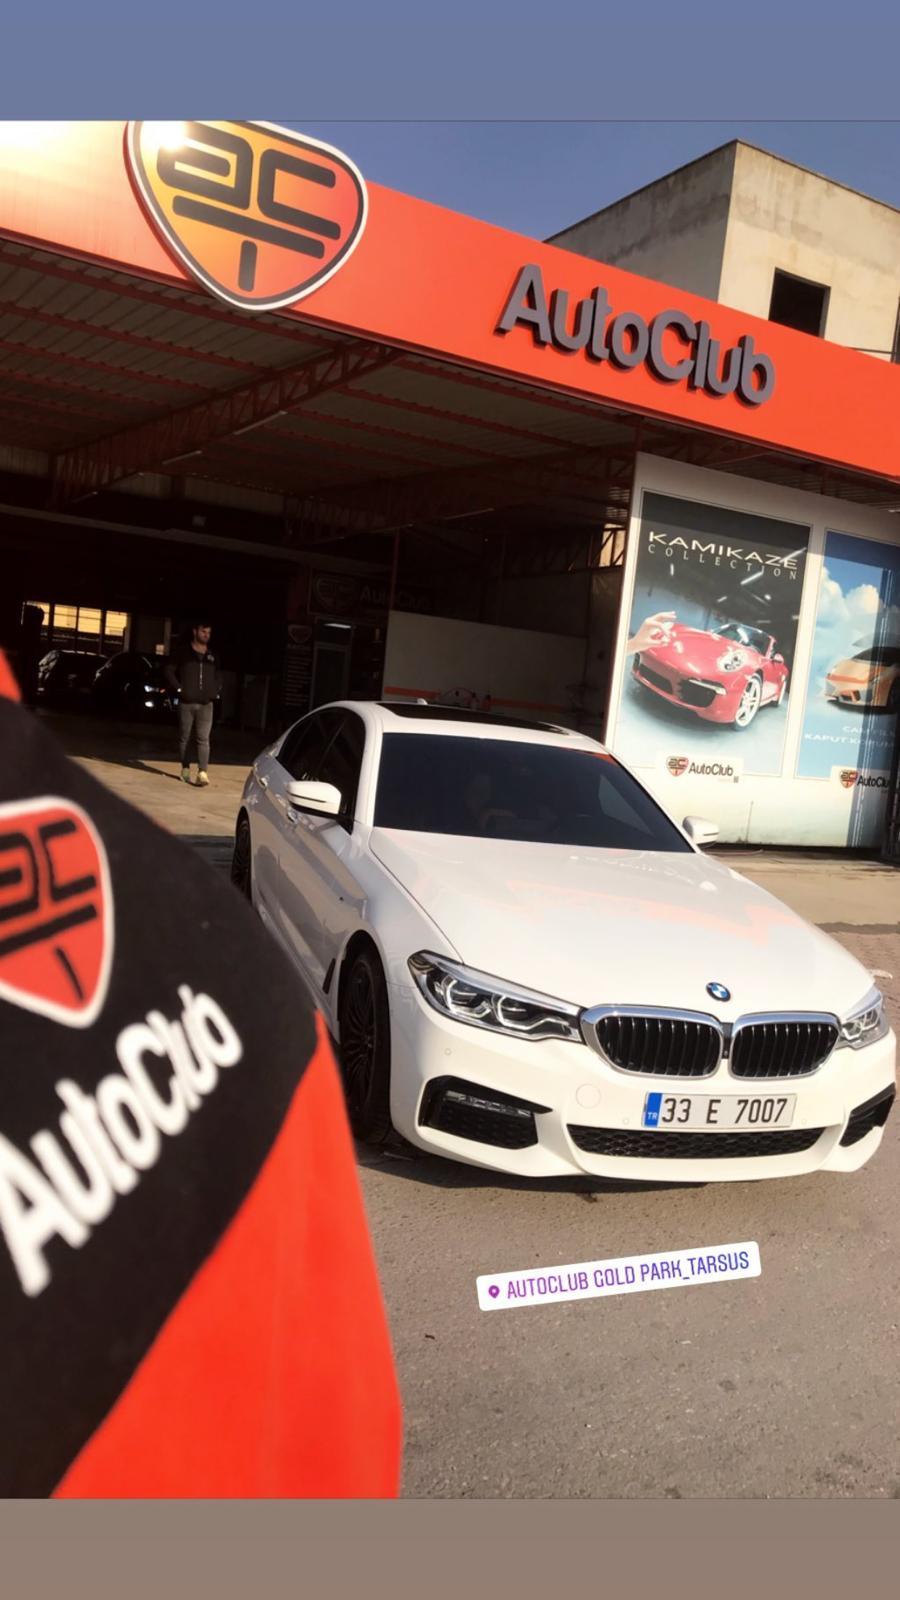 AutoClub Gold Park - Mersin